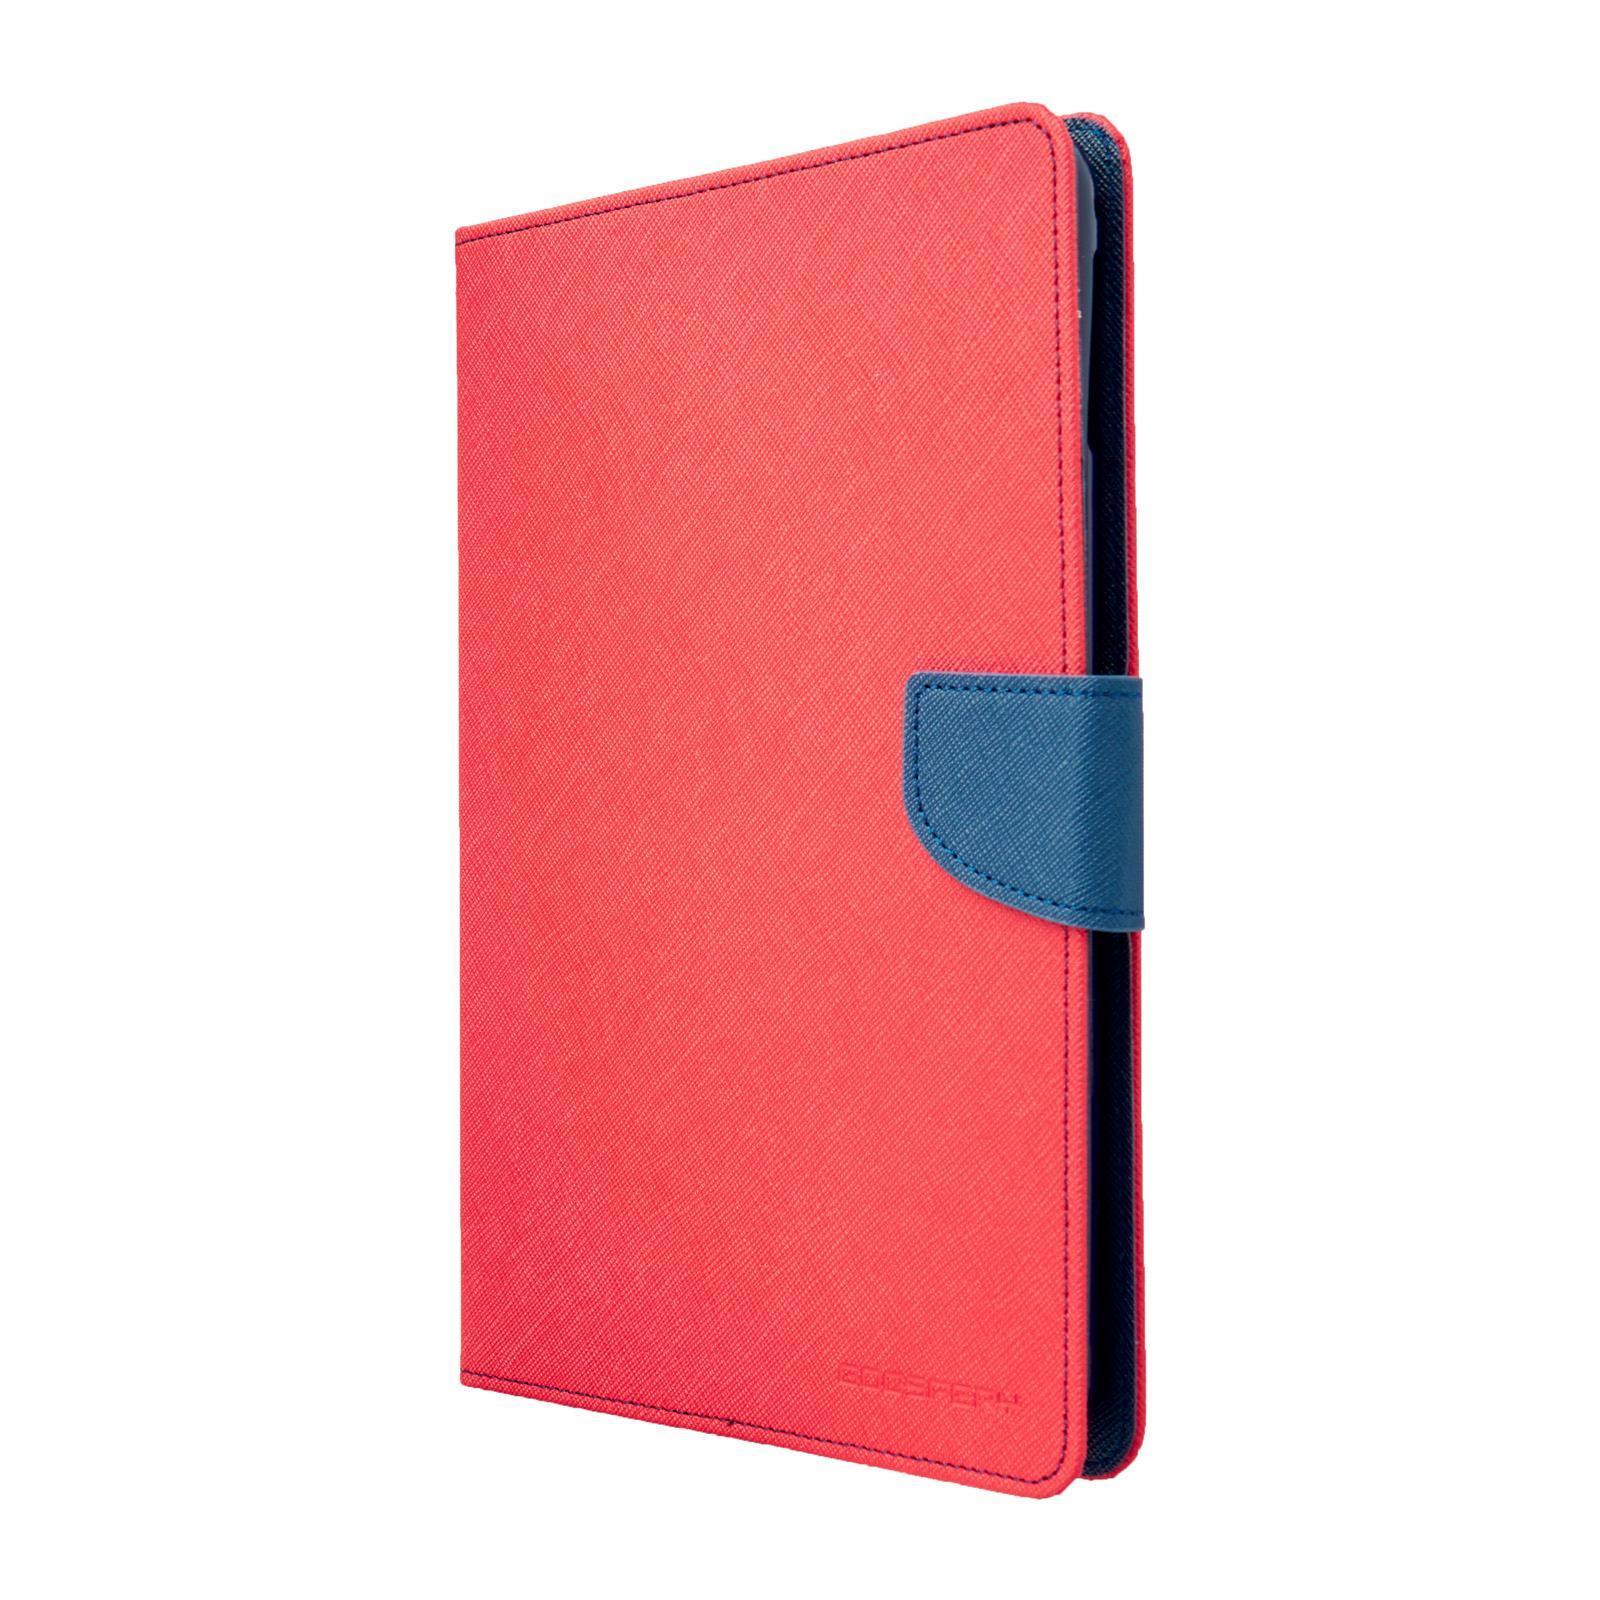 the best attitude bedbe 99e10 Mercury Goospery Ipad Mini 4 Goospery Fancy Diary Case - Red/Navy